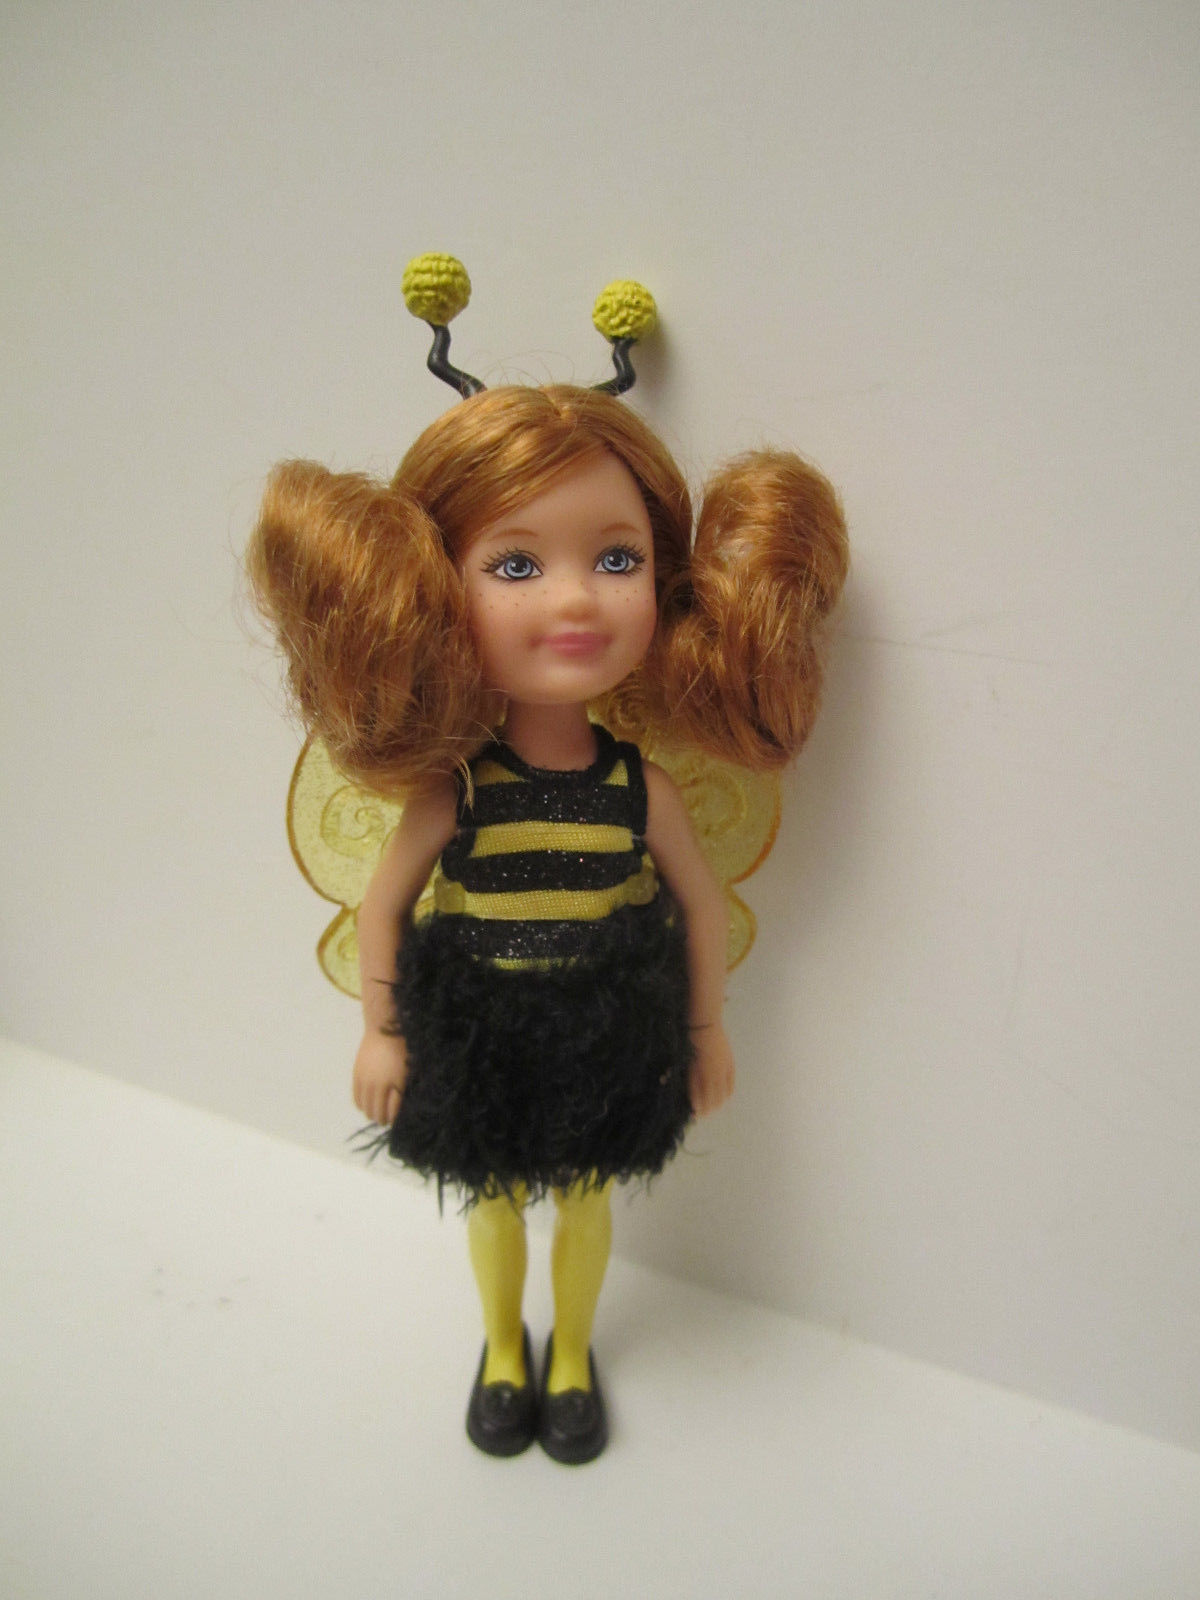 MINT 2011 Target Exclusive Halloween Chelsea Friend RedheadLoose Barbie Li'l Sis